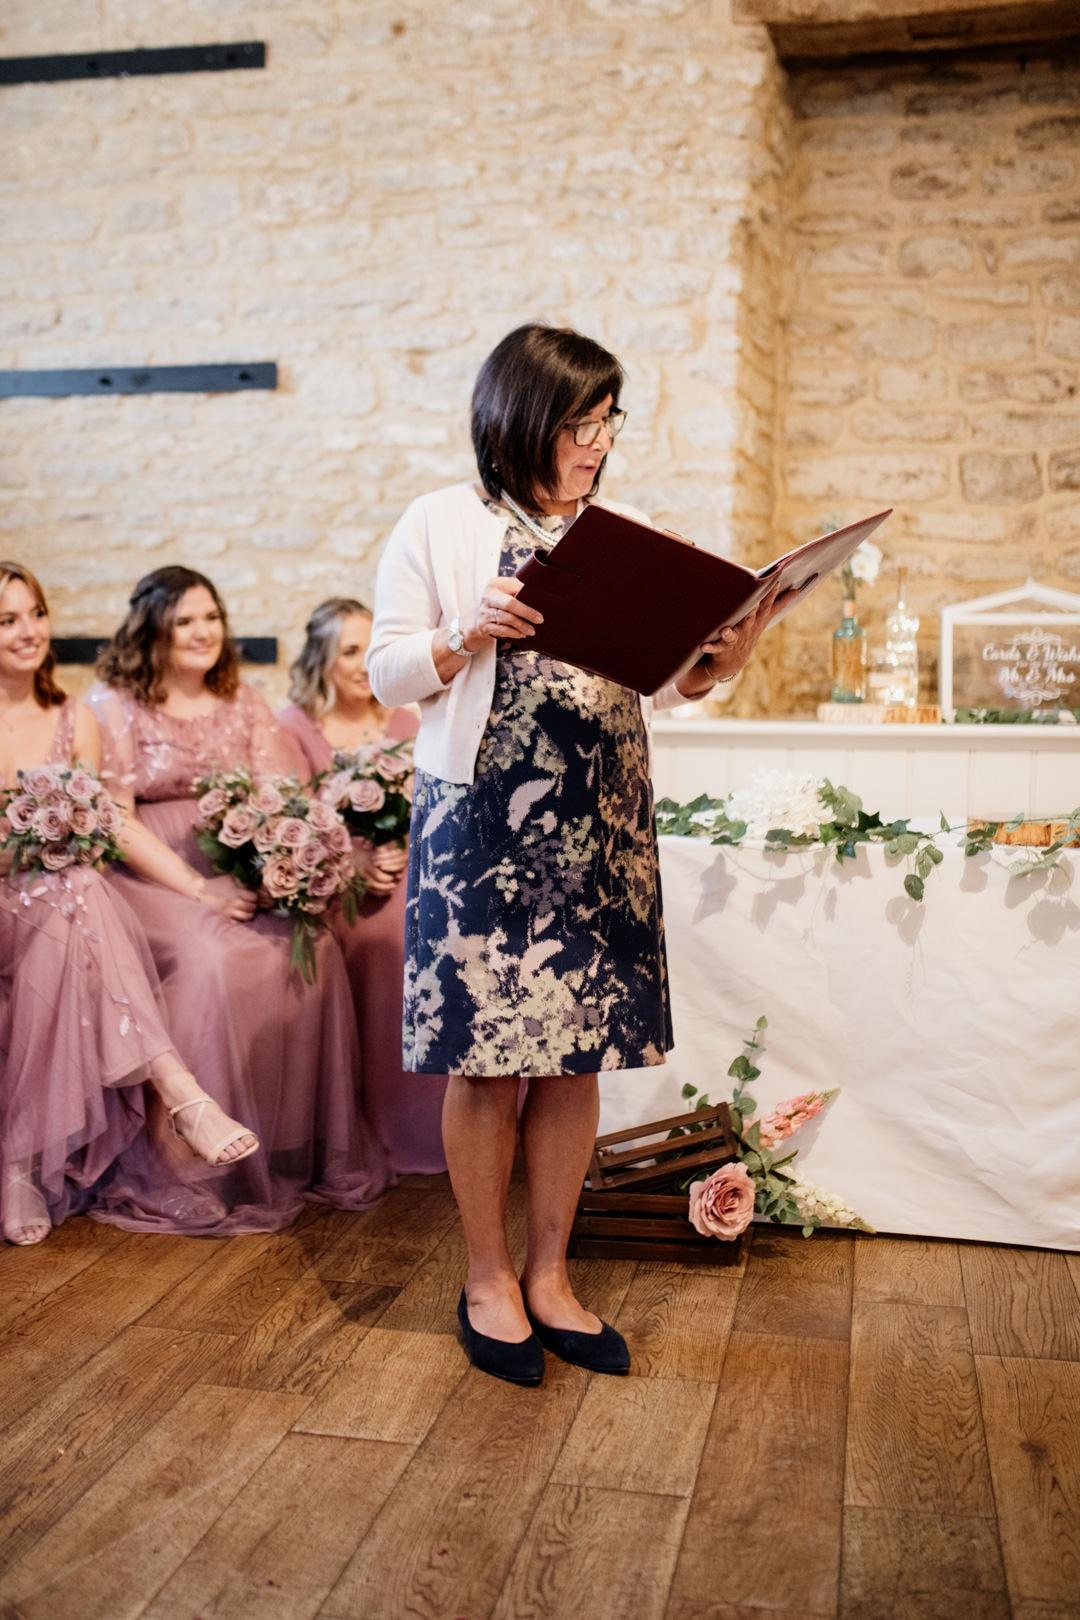 Wedding Celebrant - reading the Love story